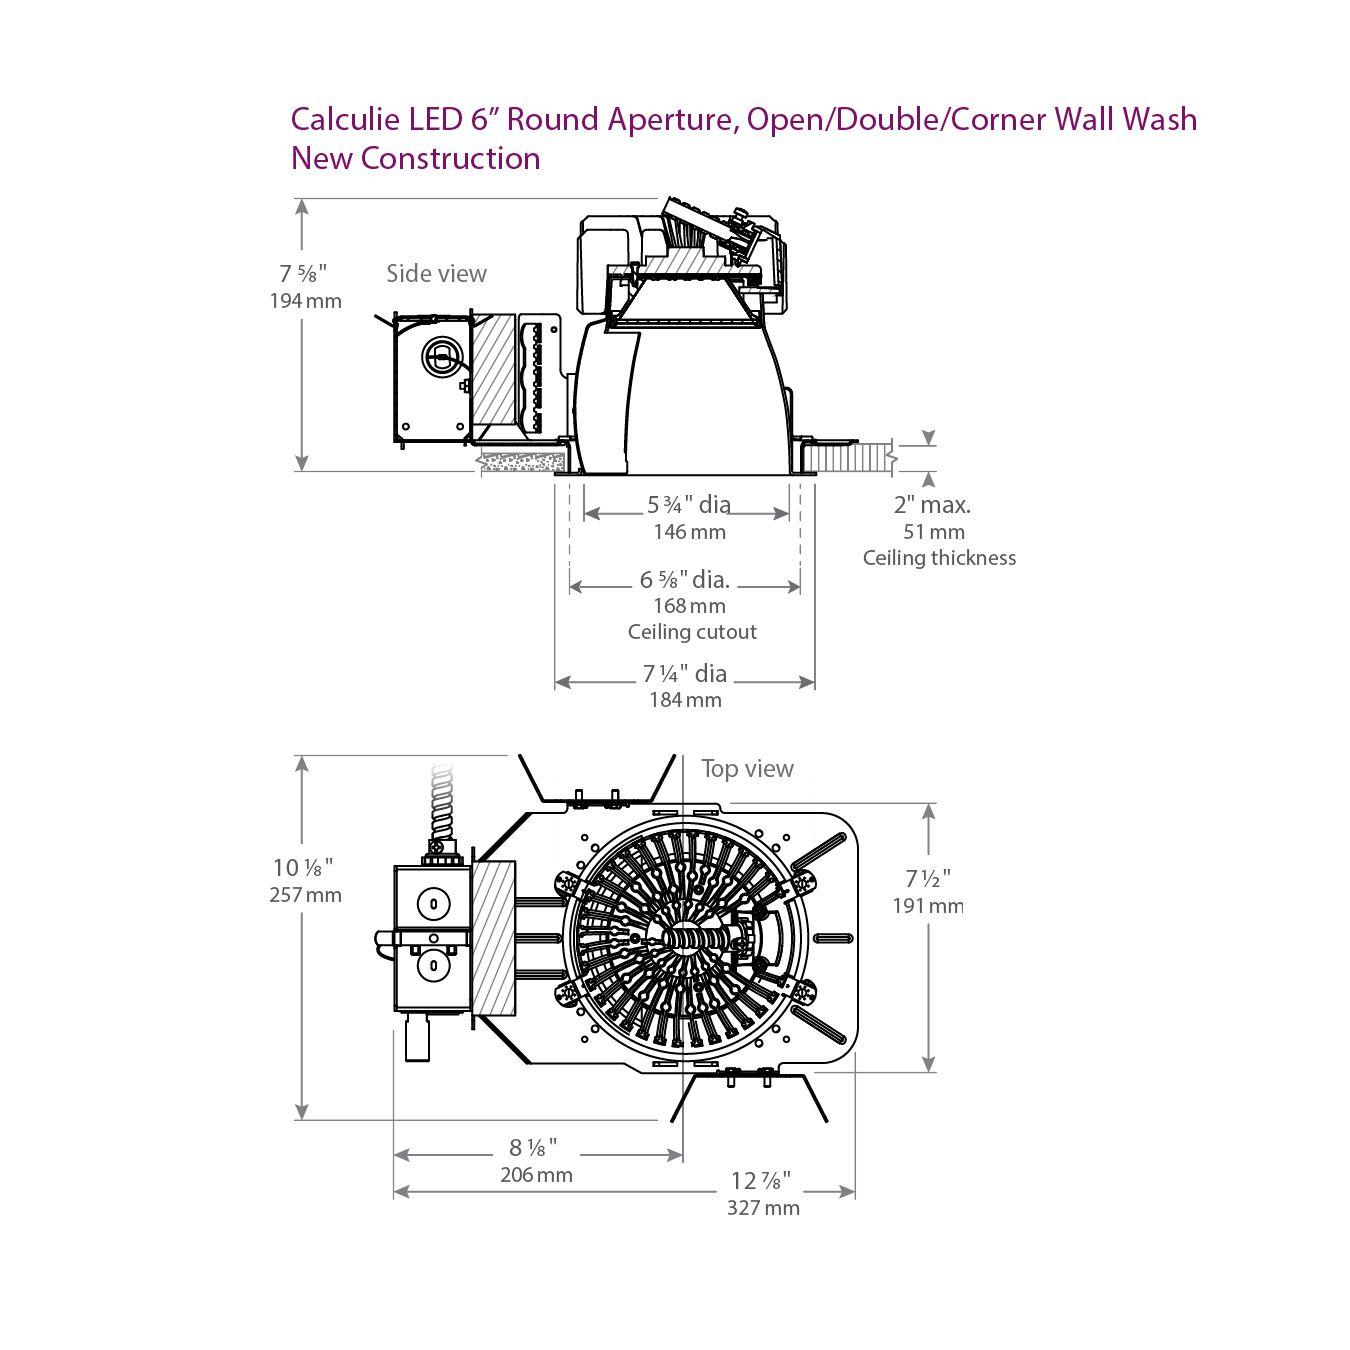 Lightolier C6l30n Calculite Led 6 Round Aperture Open